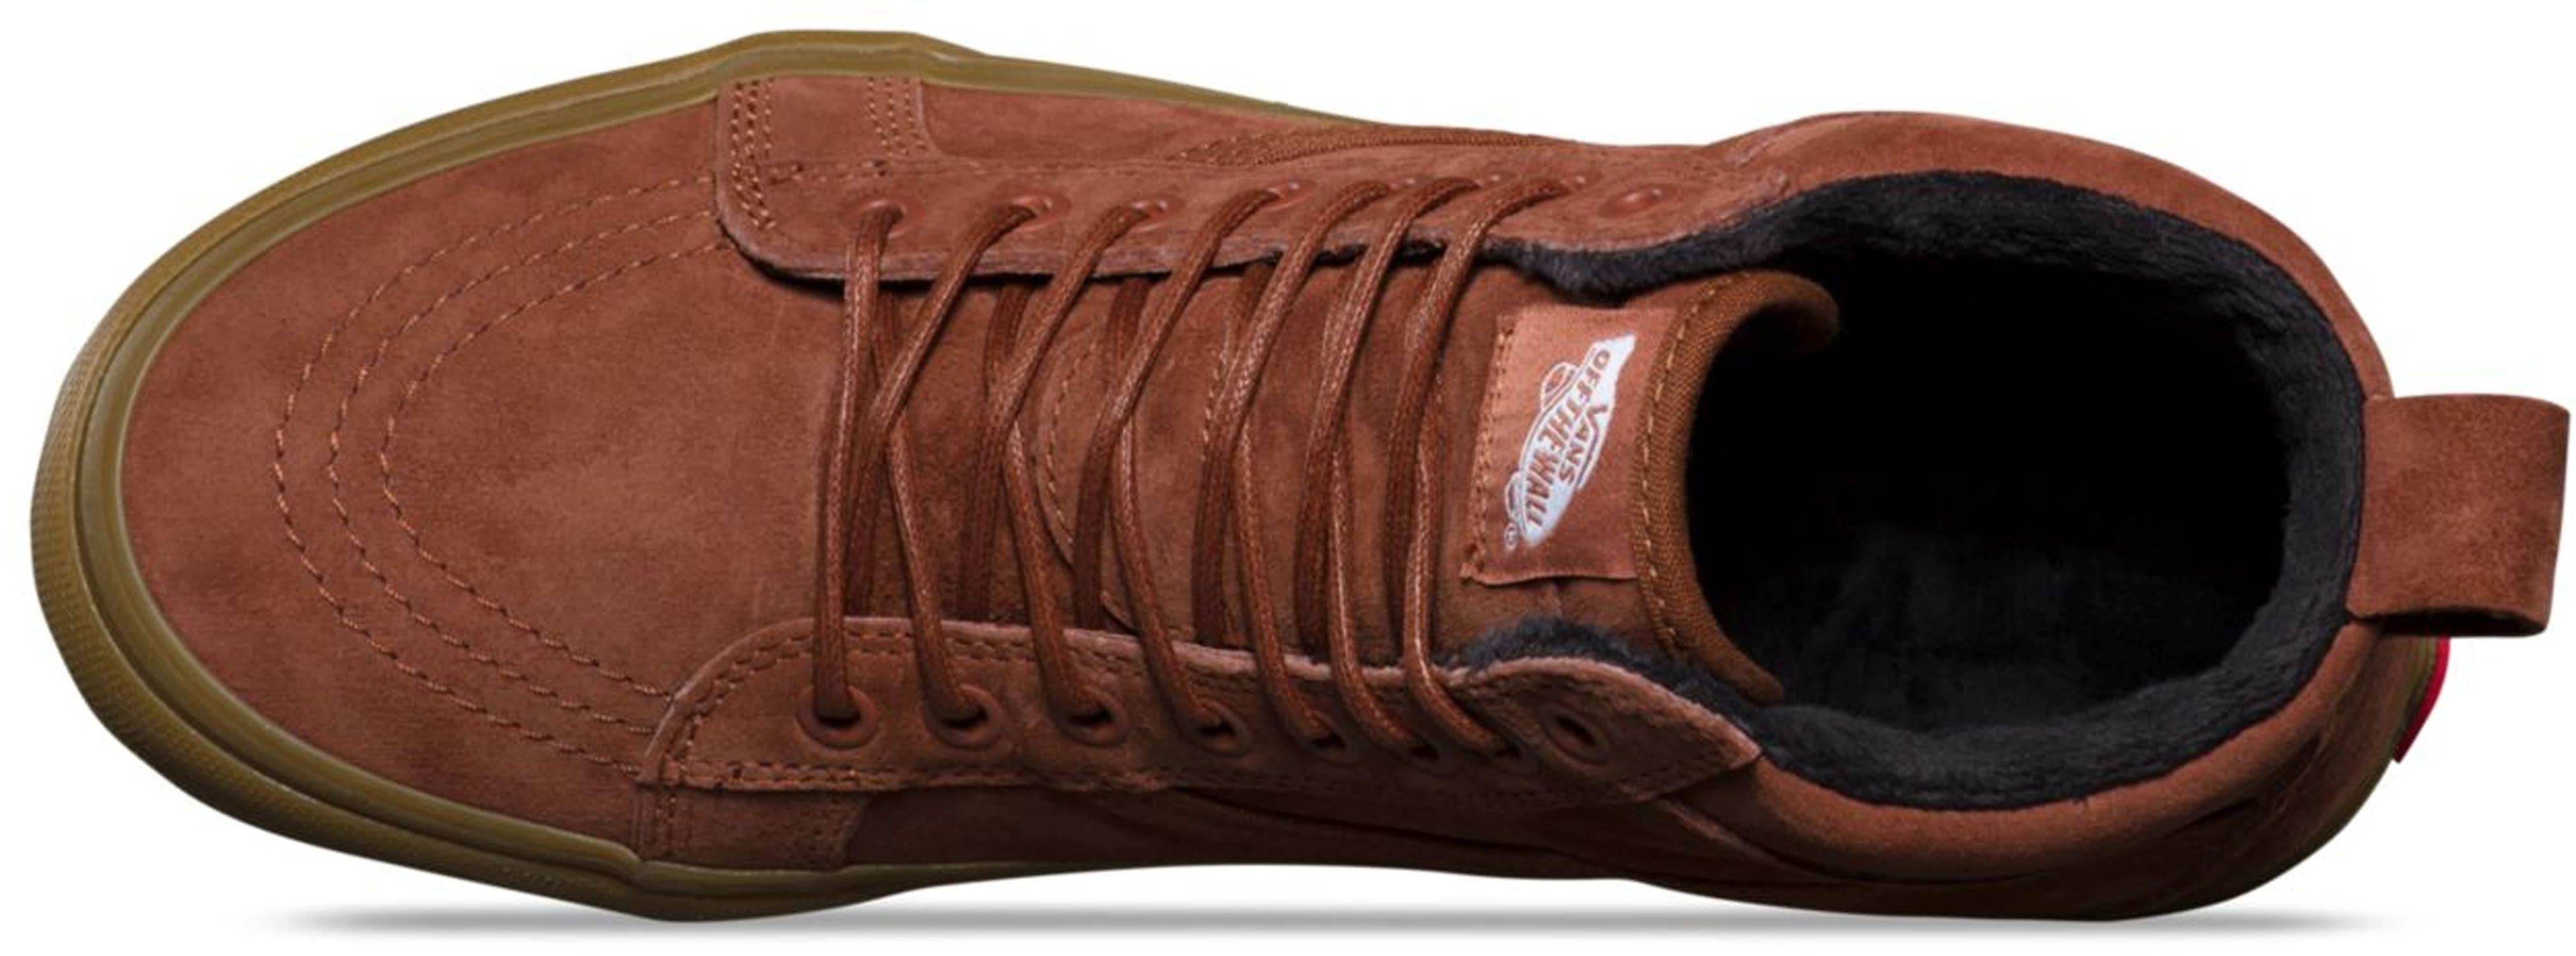 ba5d258ab6c941 Vans Sk8-Hi MTE Shoes - thumbnail 4